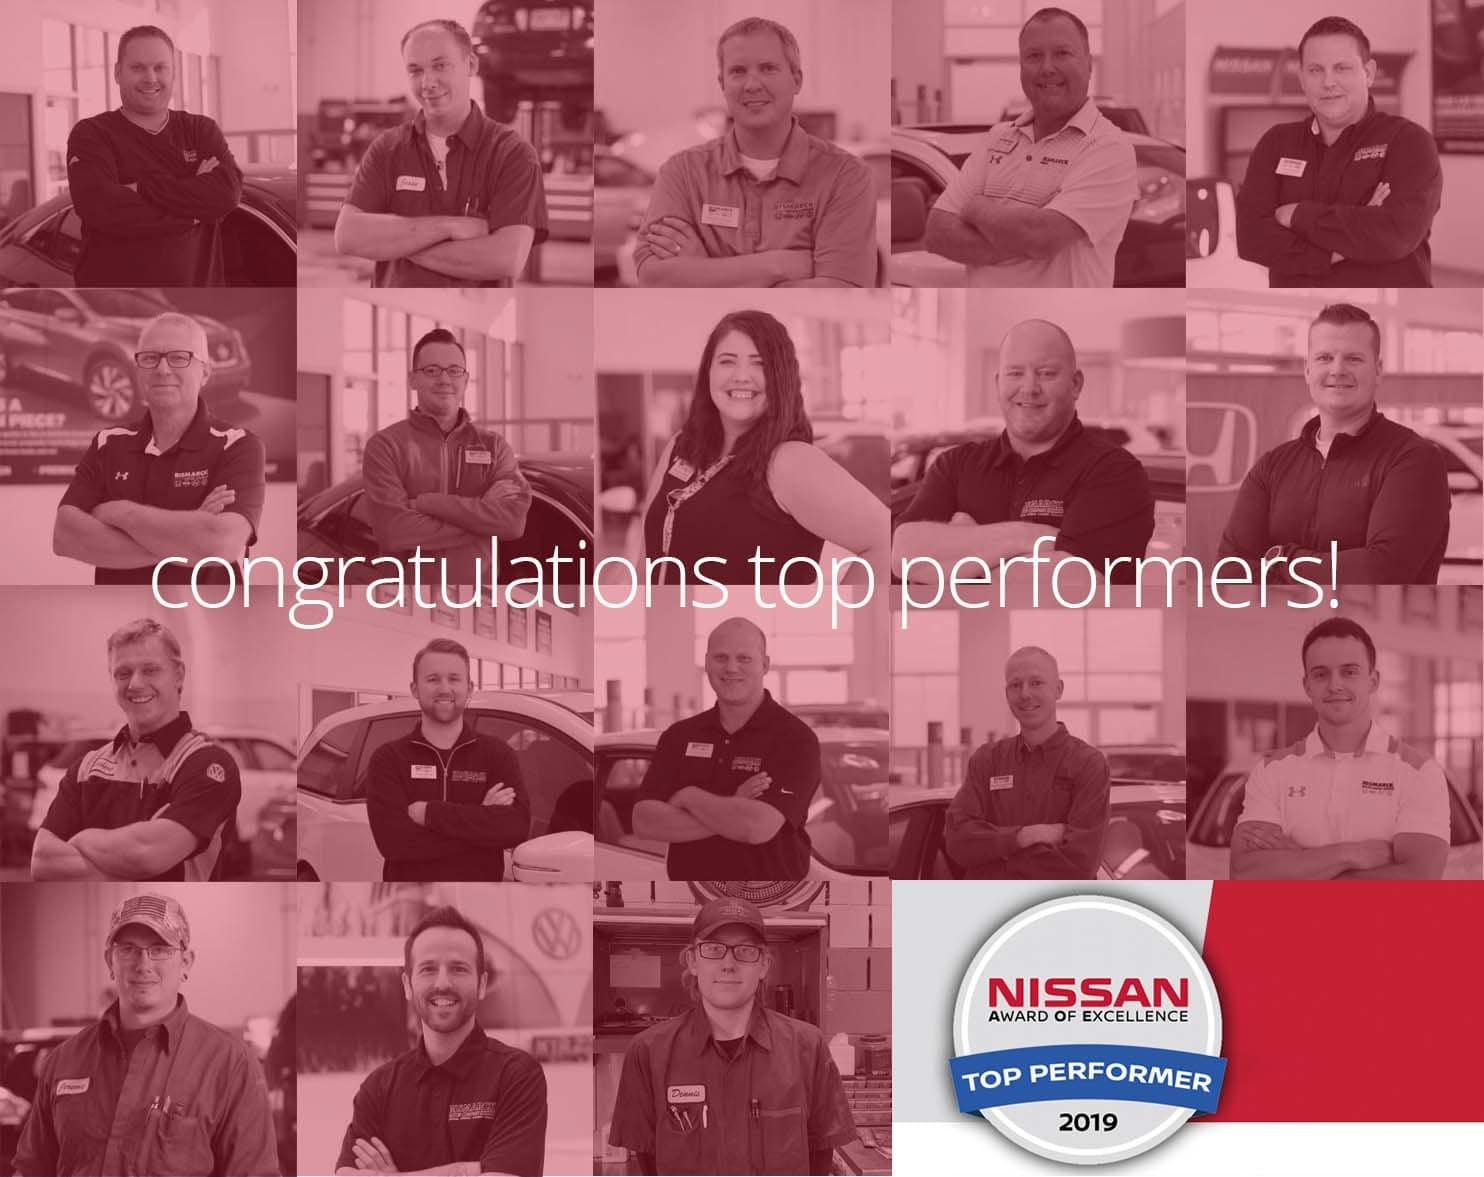 Nissan Top Performers